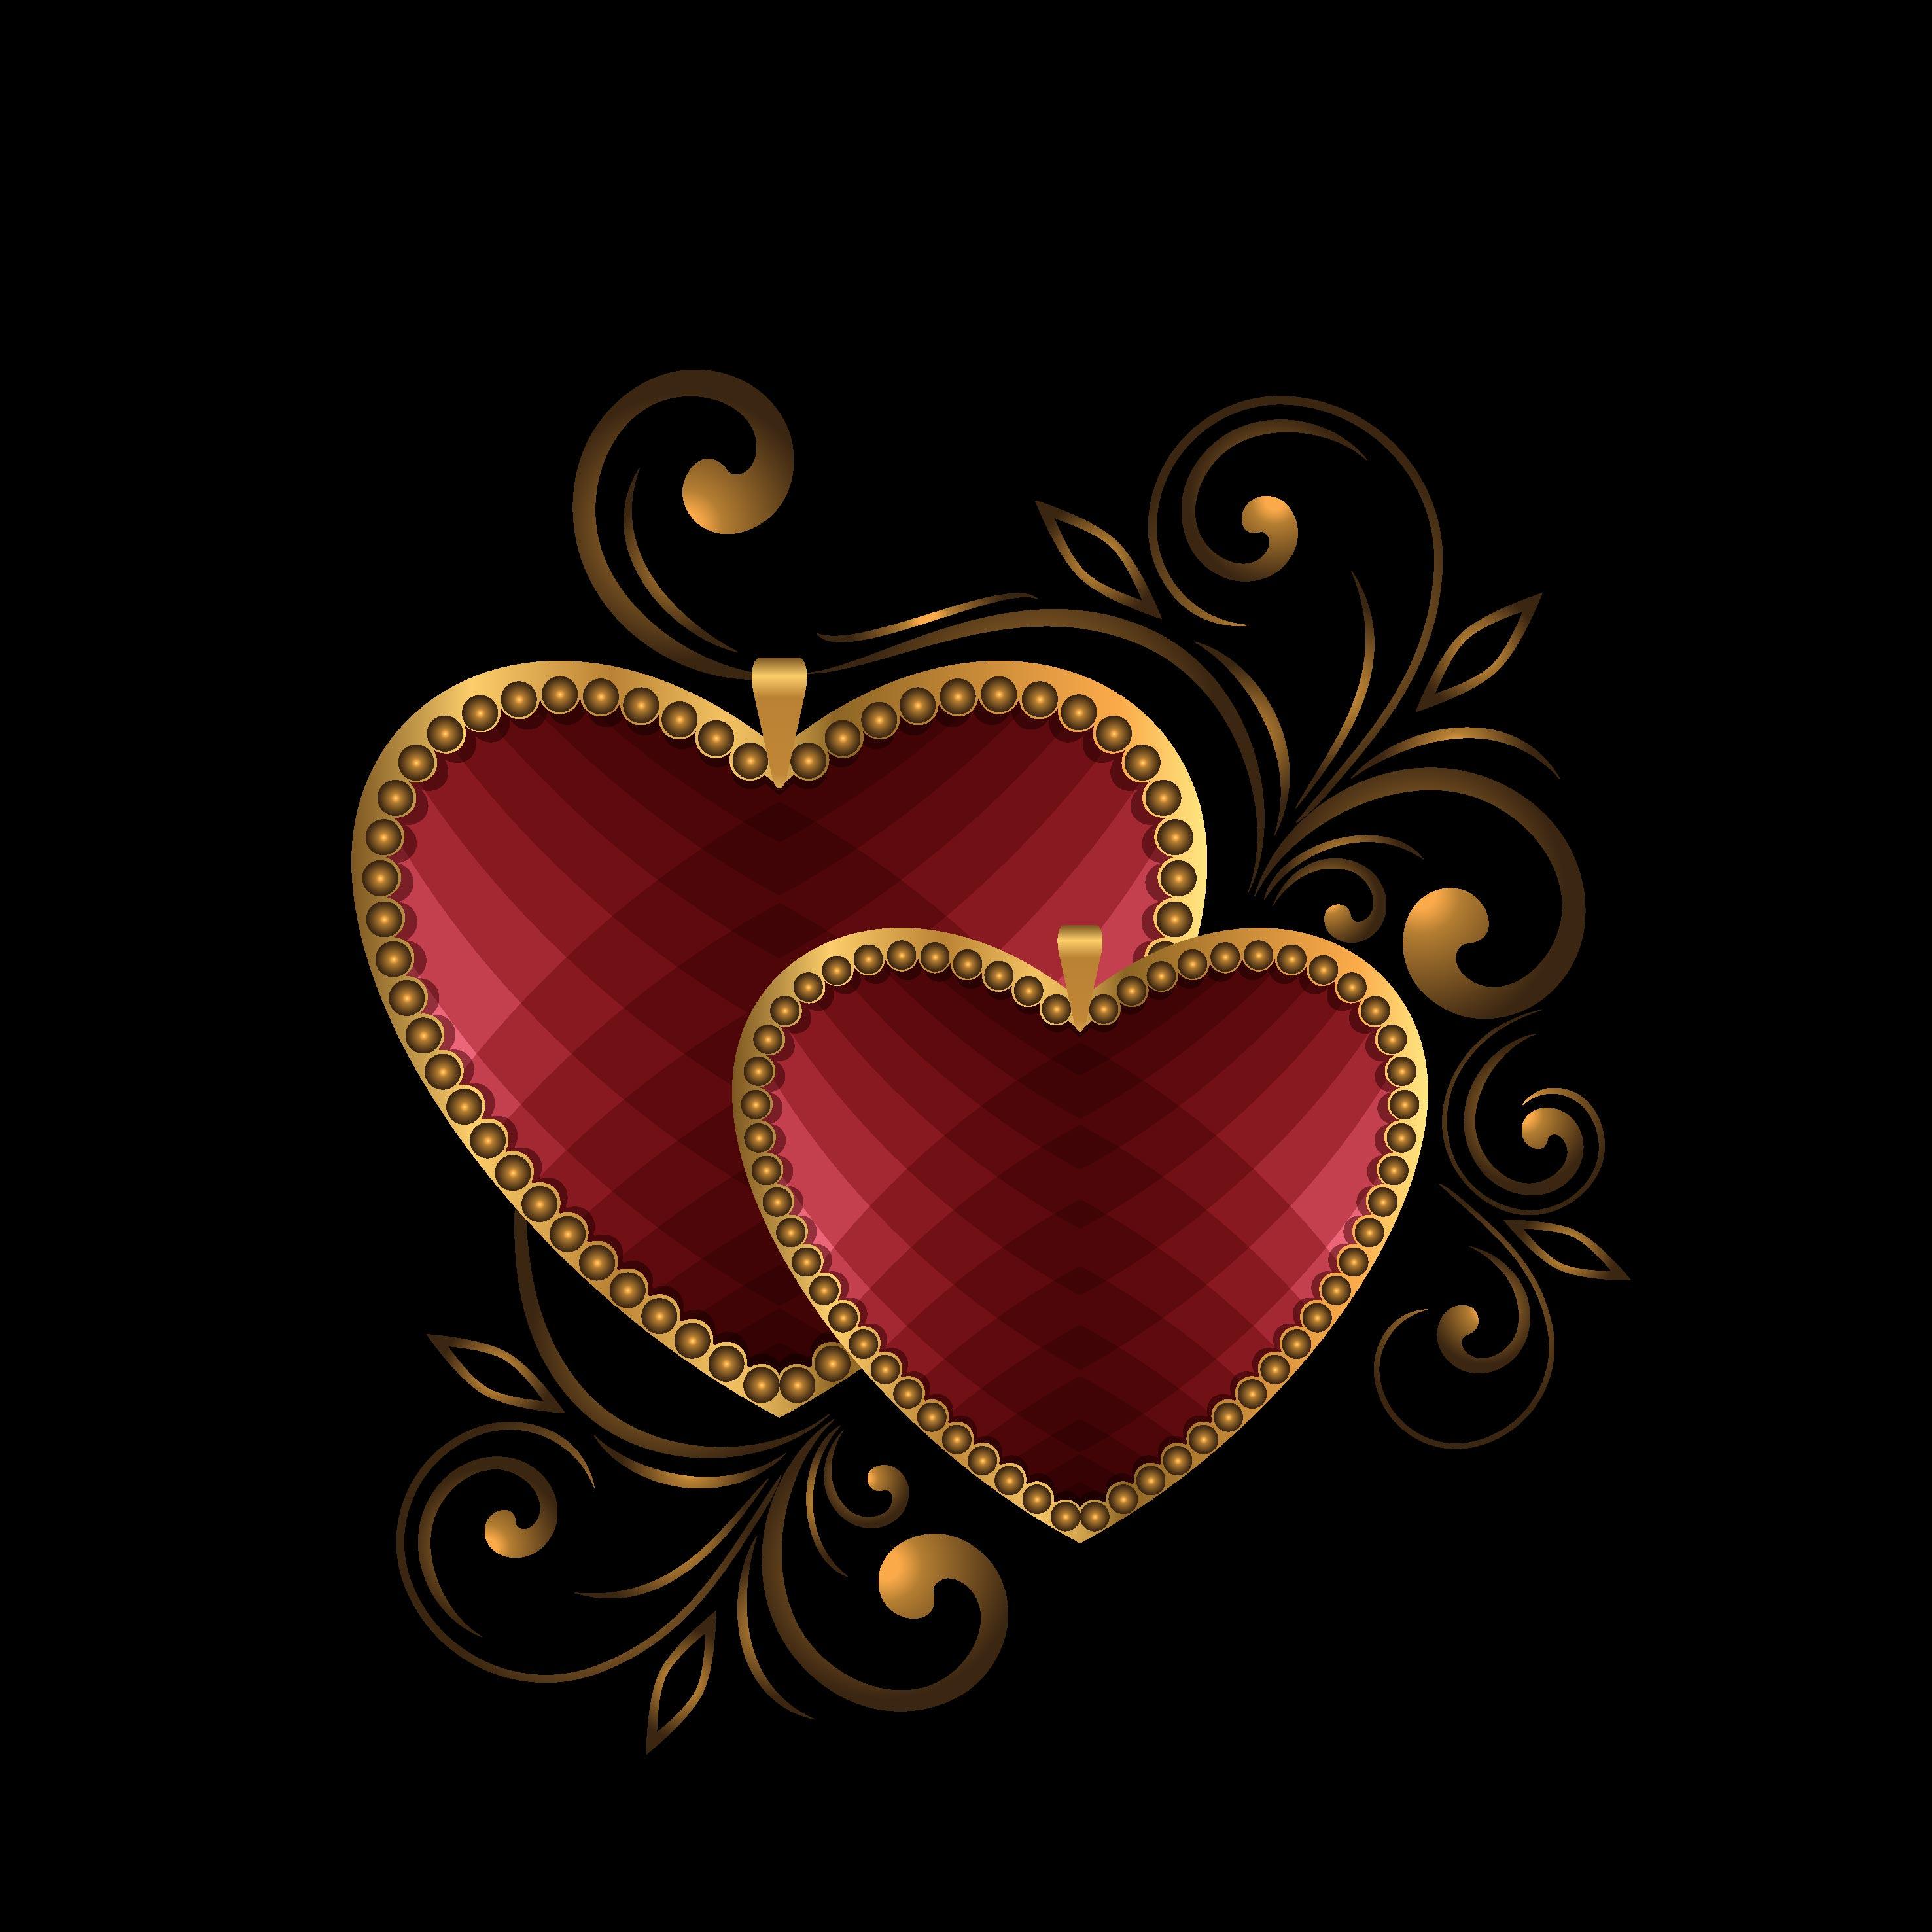 romantique de motif de fond en forme de coeur de phnom